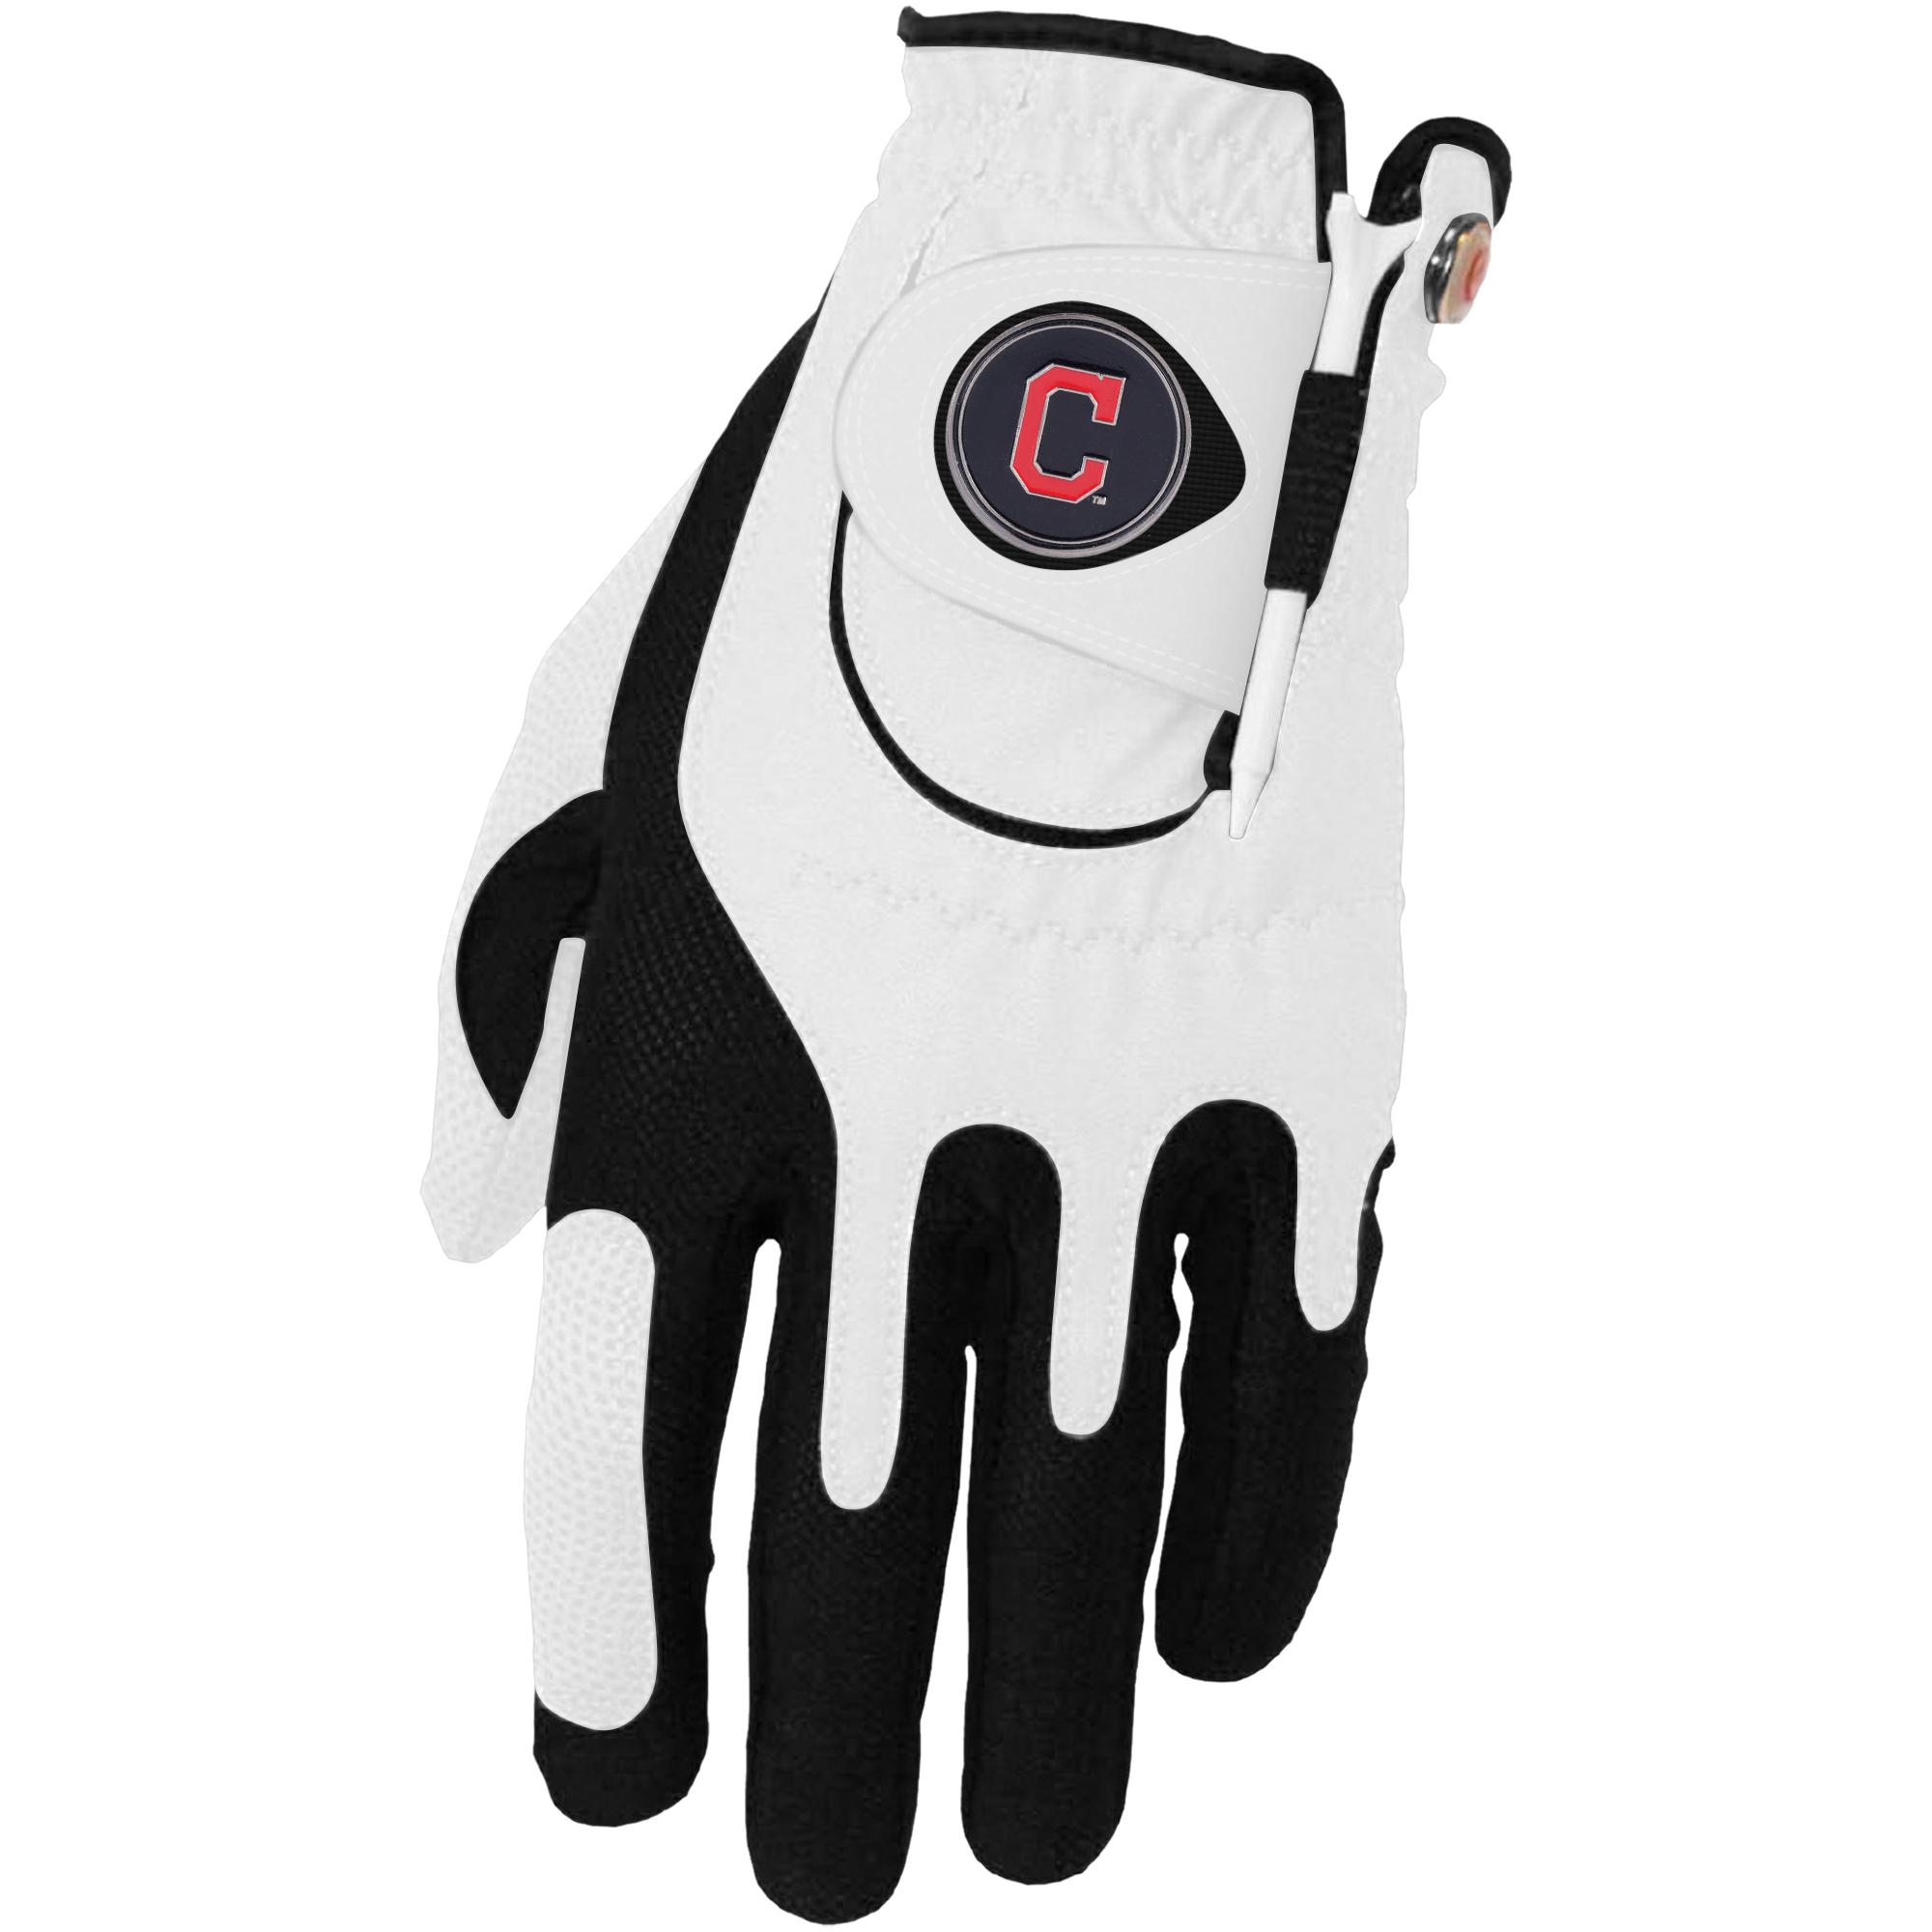 Cleveland Indians Left Hand Golf Glove & Ball Marker Set - White - OSFM